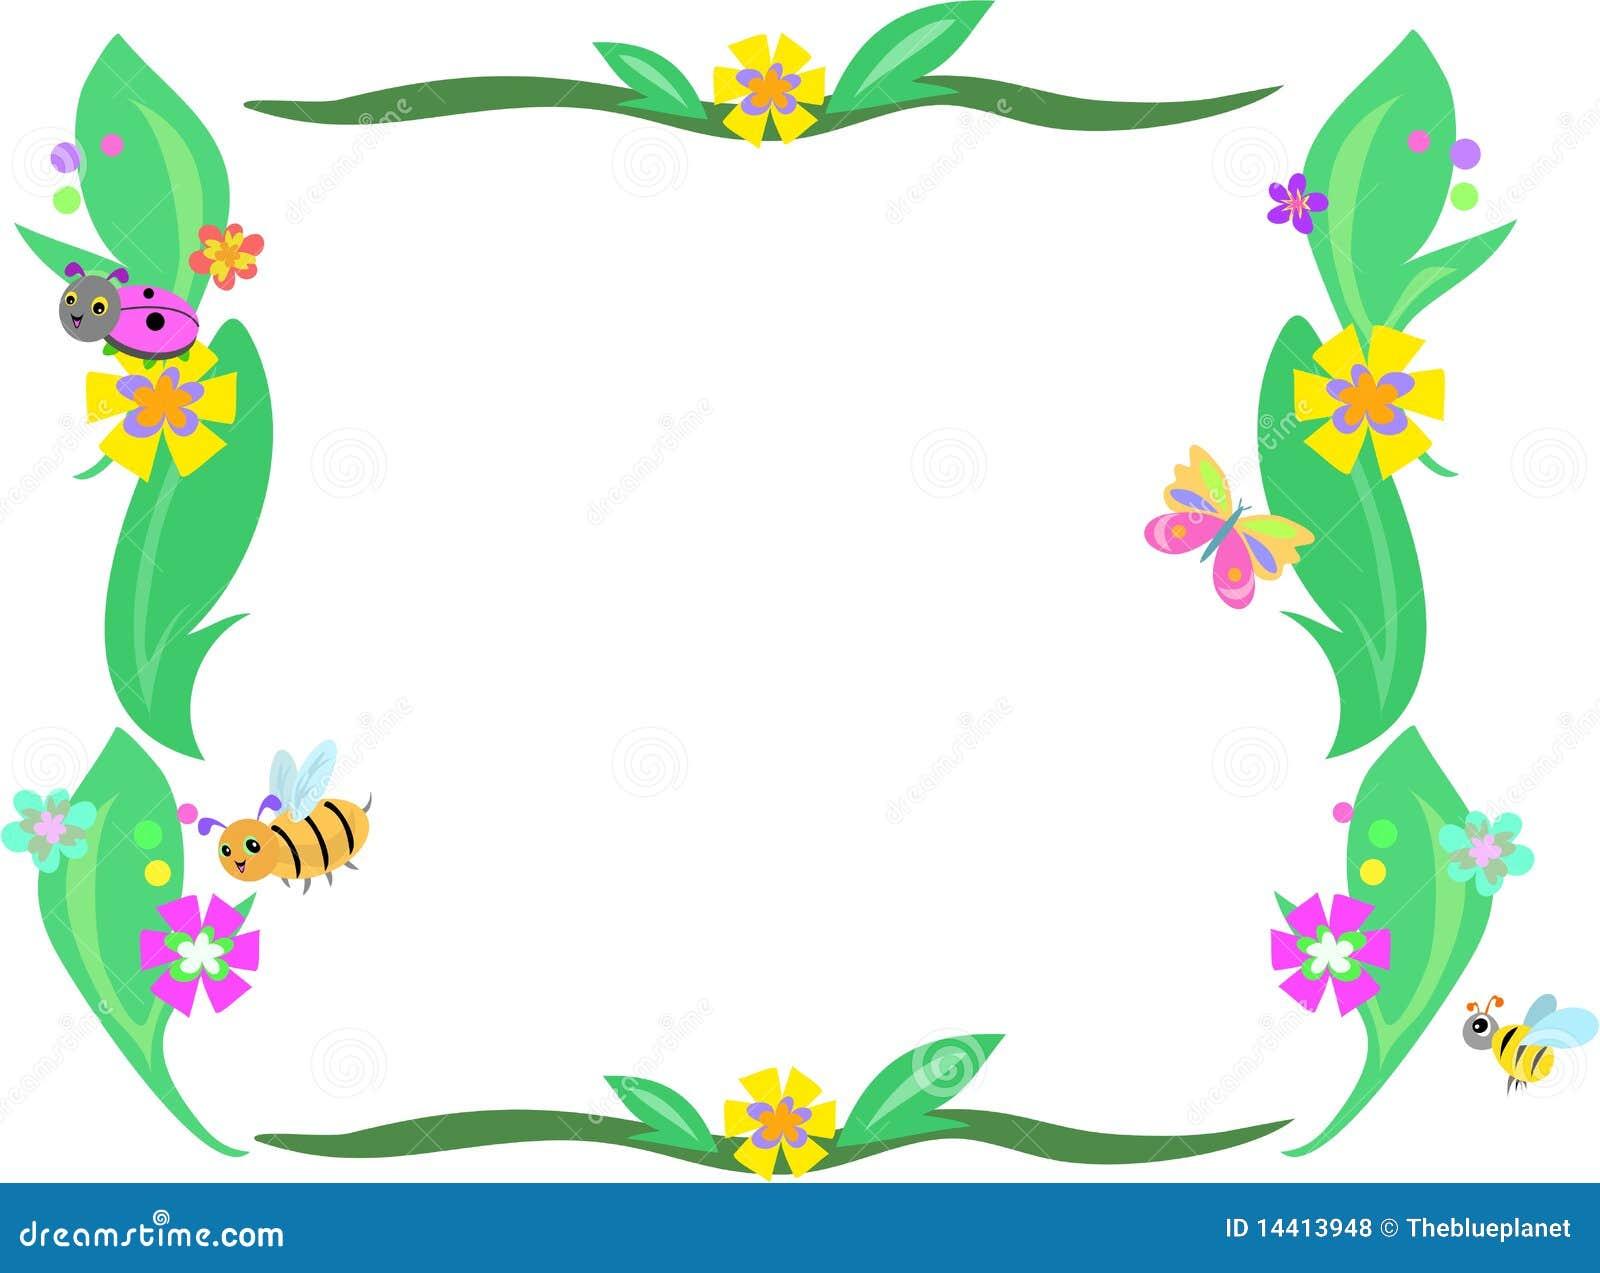 Marco Para Hoja De Flores